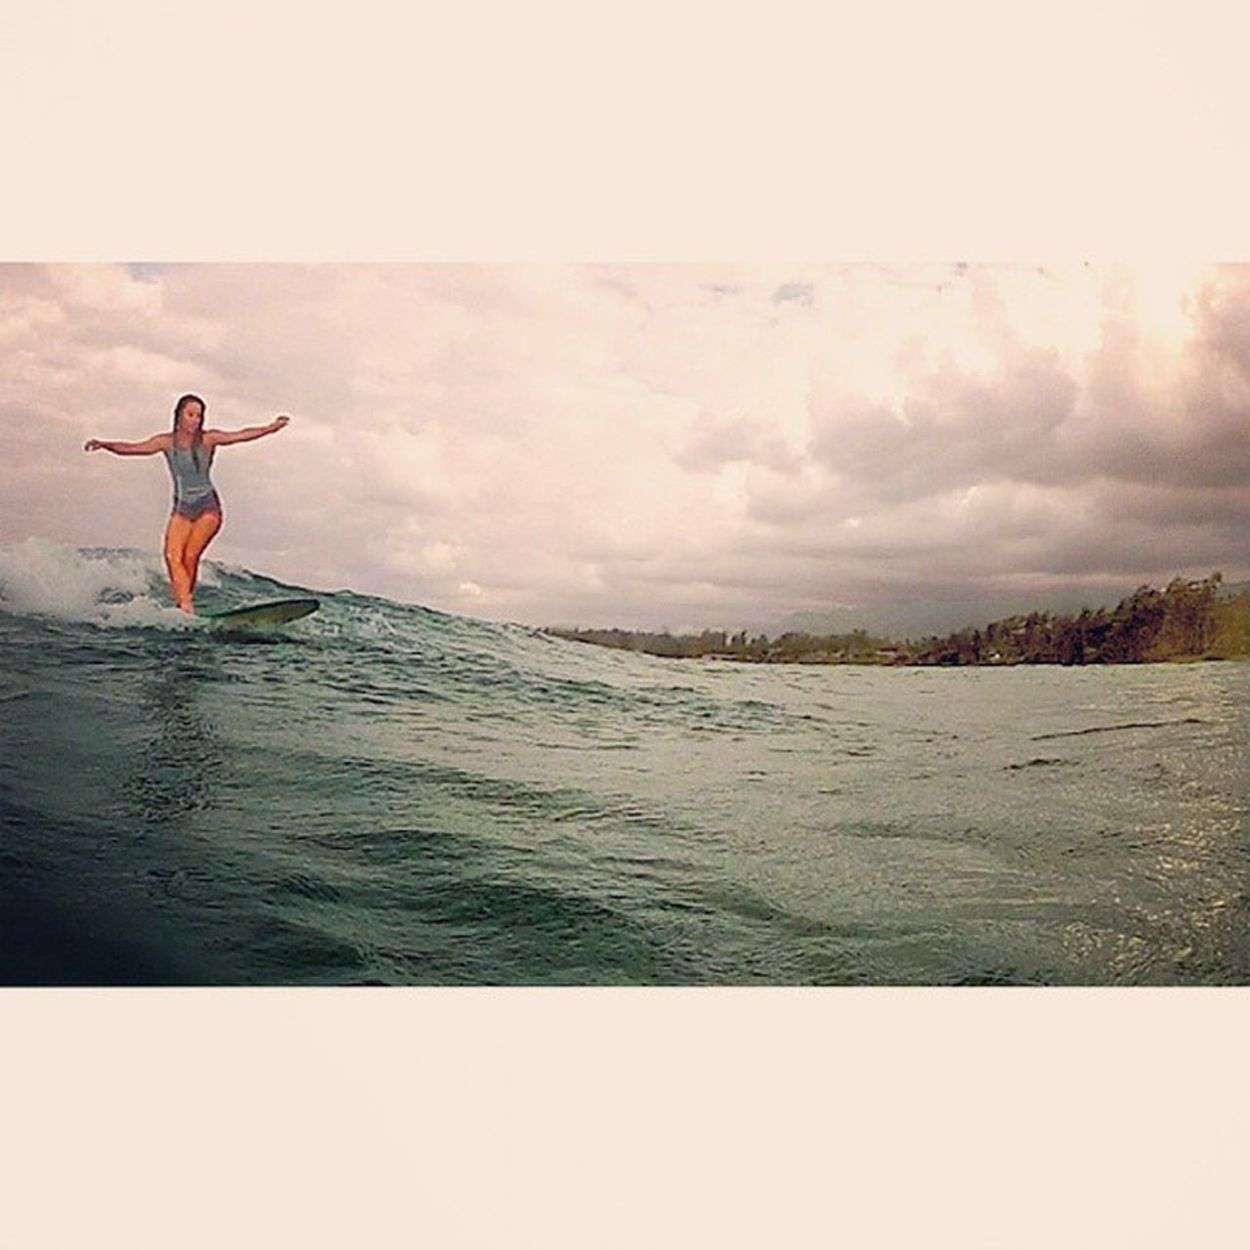 Cross step Lifesabeach  Summertime Lifeonthewater Longboardride staywet hawaii livethesearch love gopro surf oceanlovers eastside crossstep justforkiks justcruising